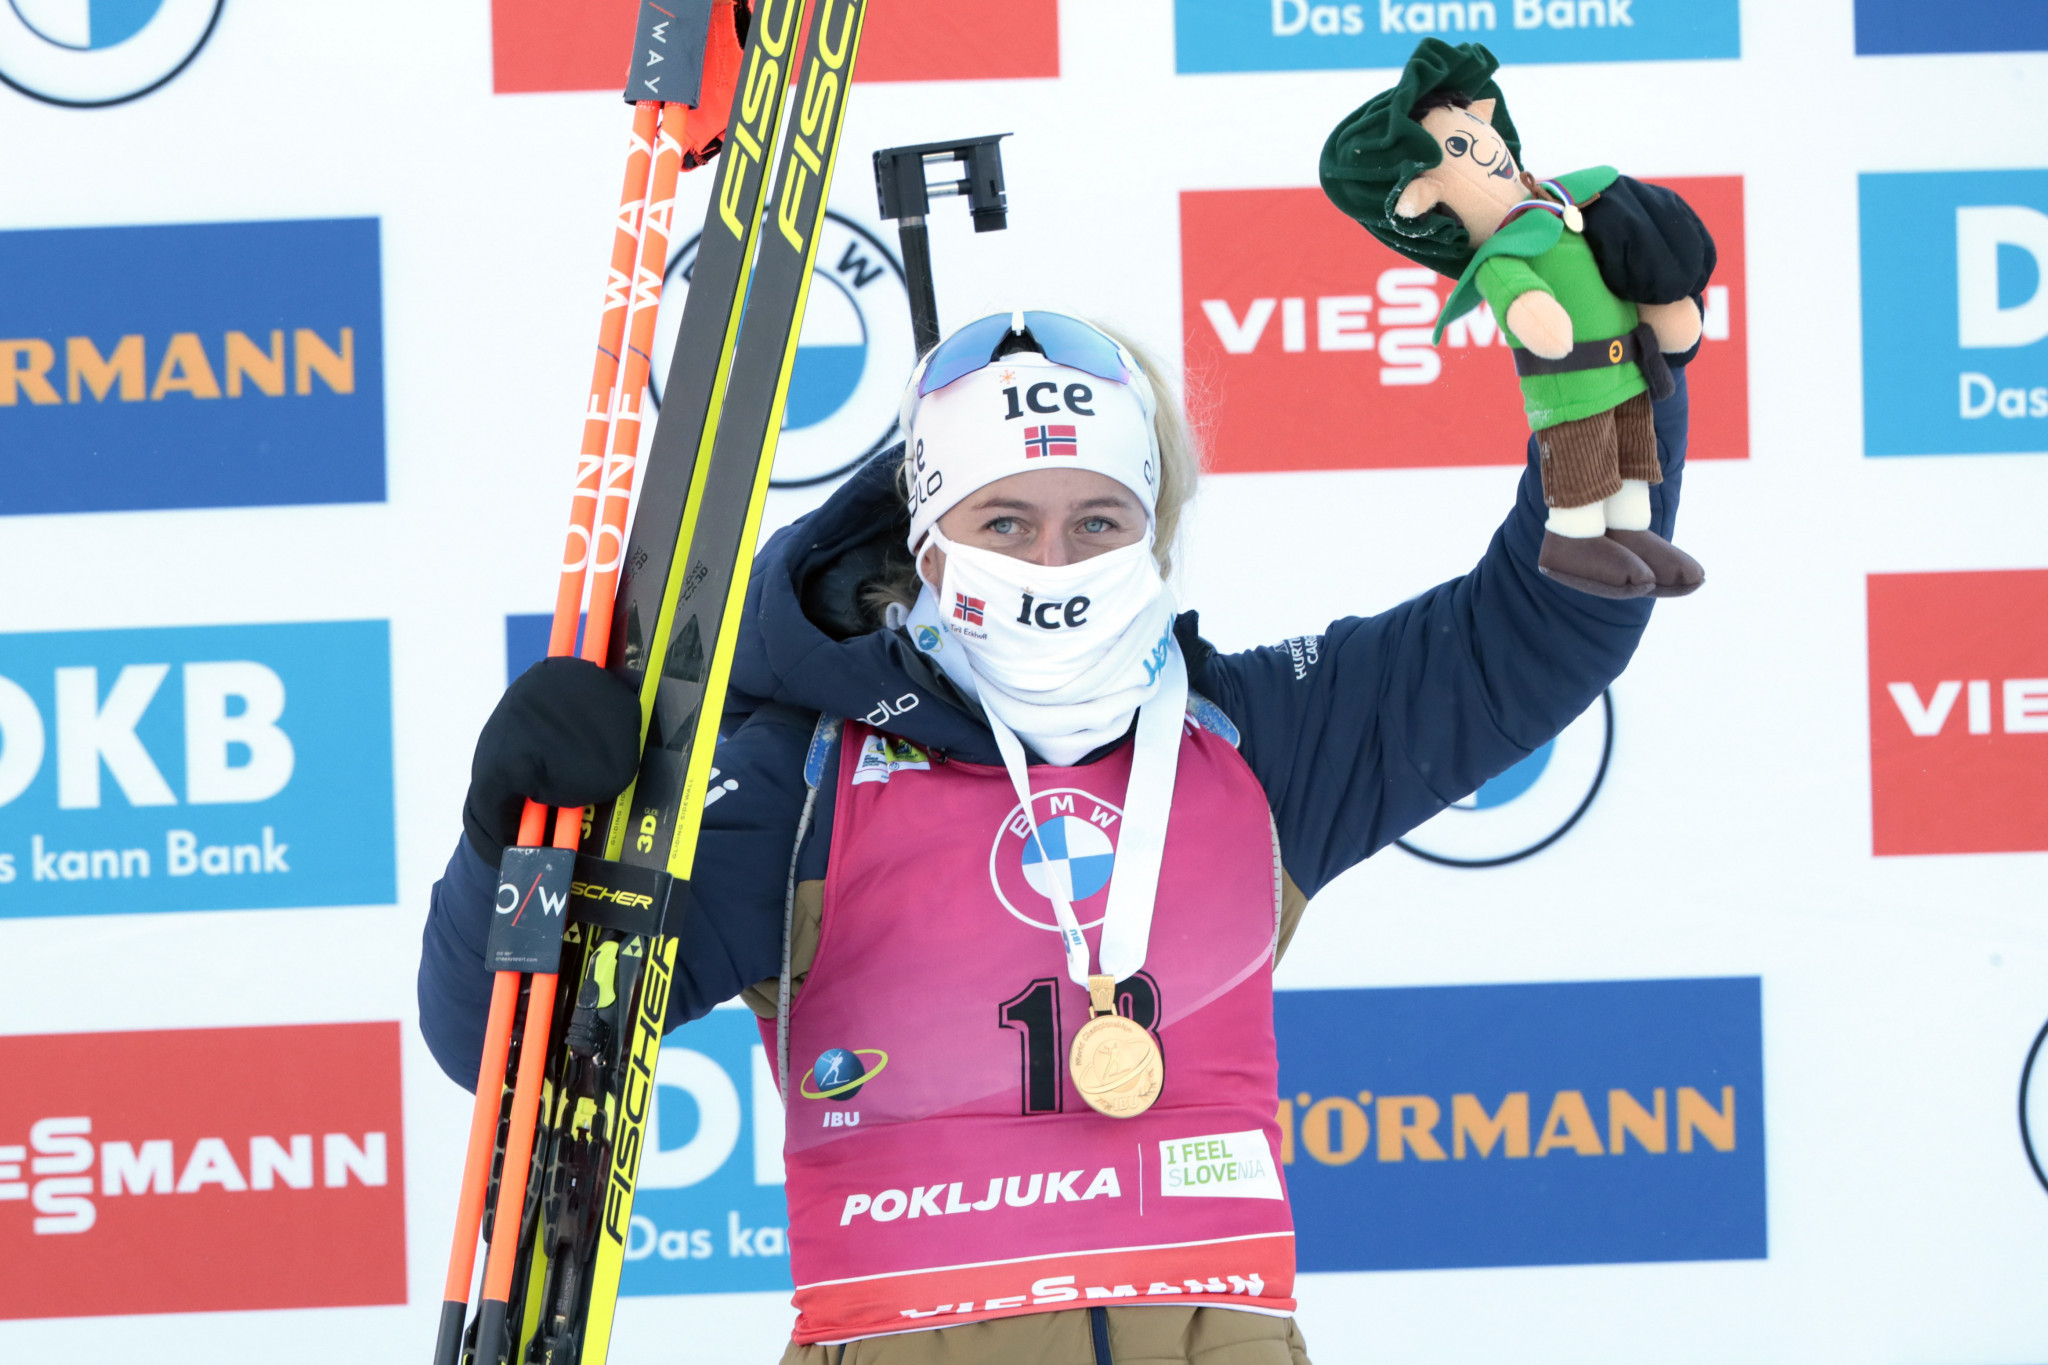 Eckhoff tops the podium again at IBU World Championships